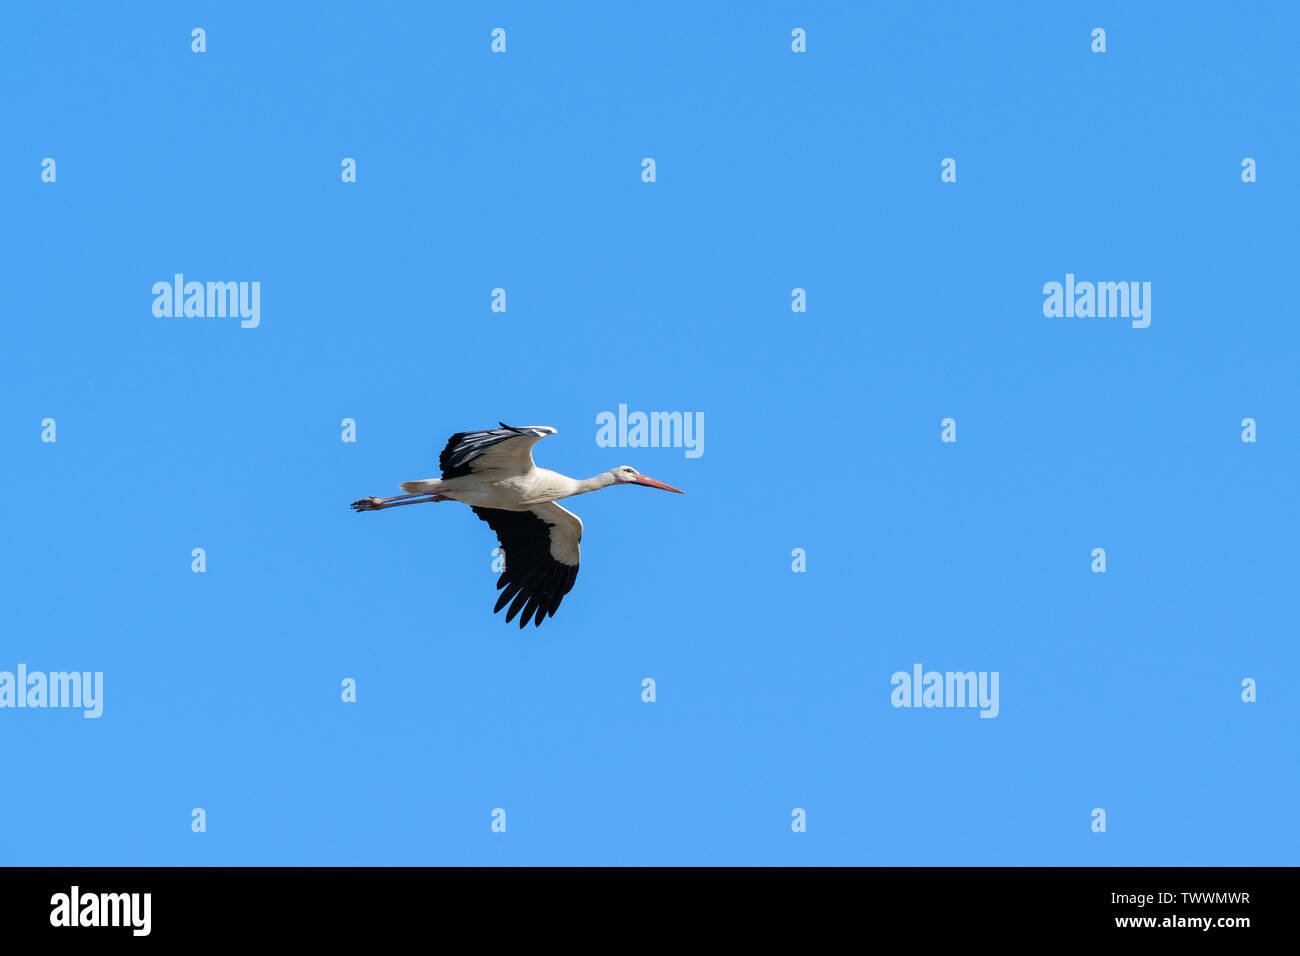 White stork (Ciconia ciconia) in flight. Extremadura. Spain. Stock Photo